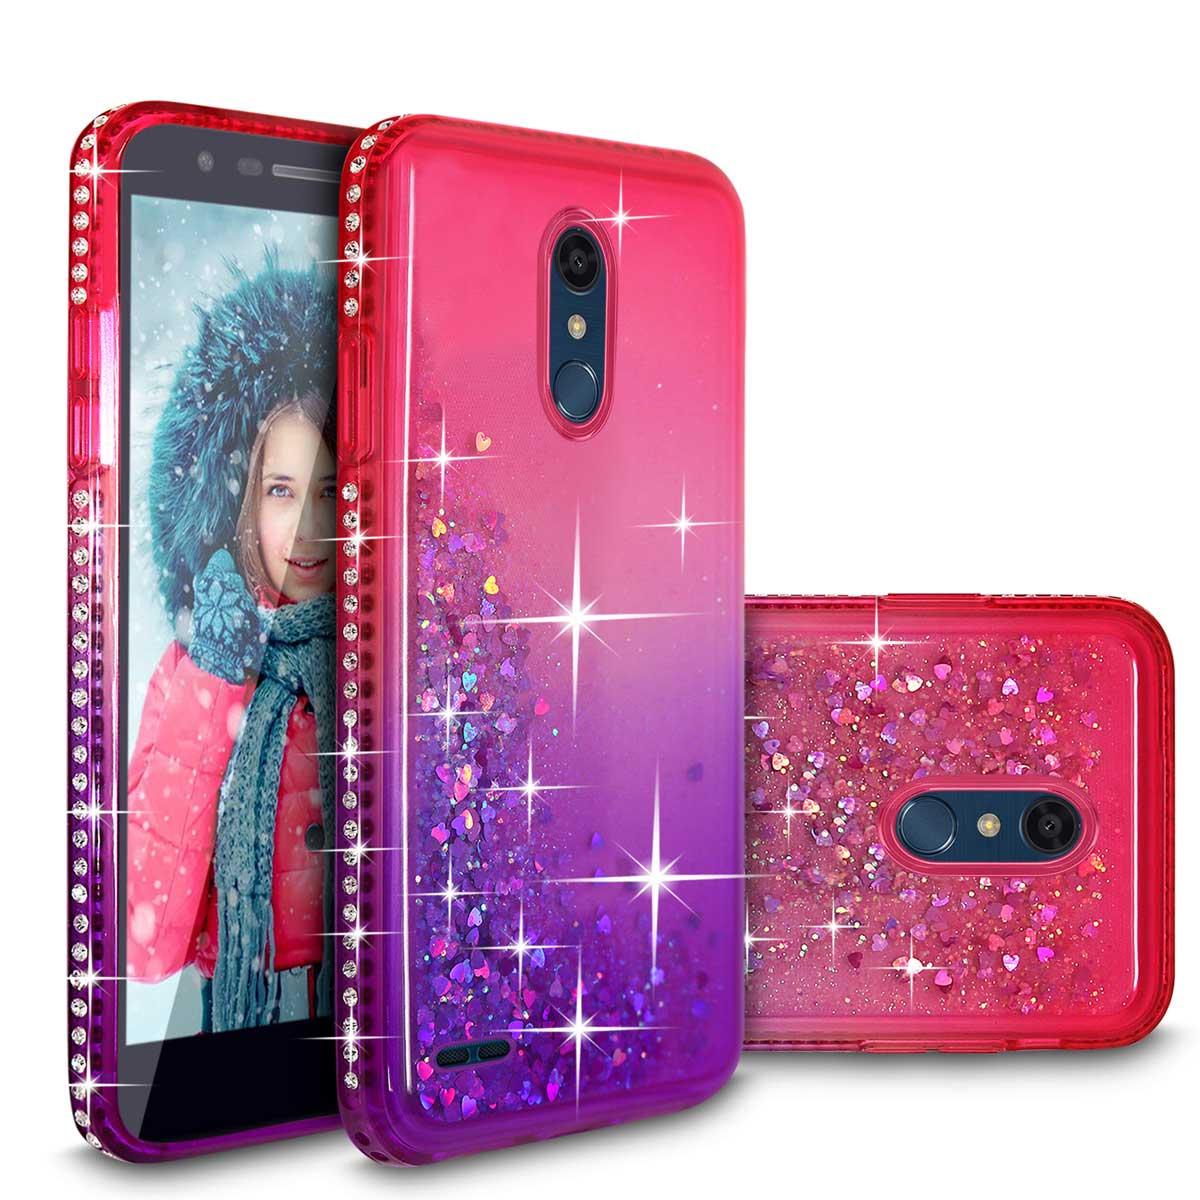 LG-K10-2018-LQ-GL-PN-PR